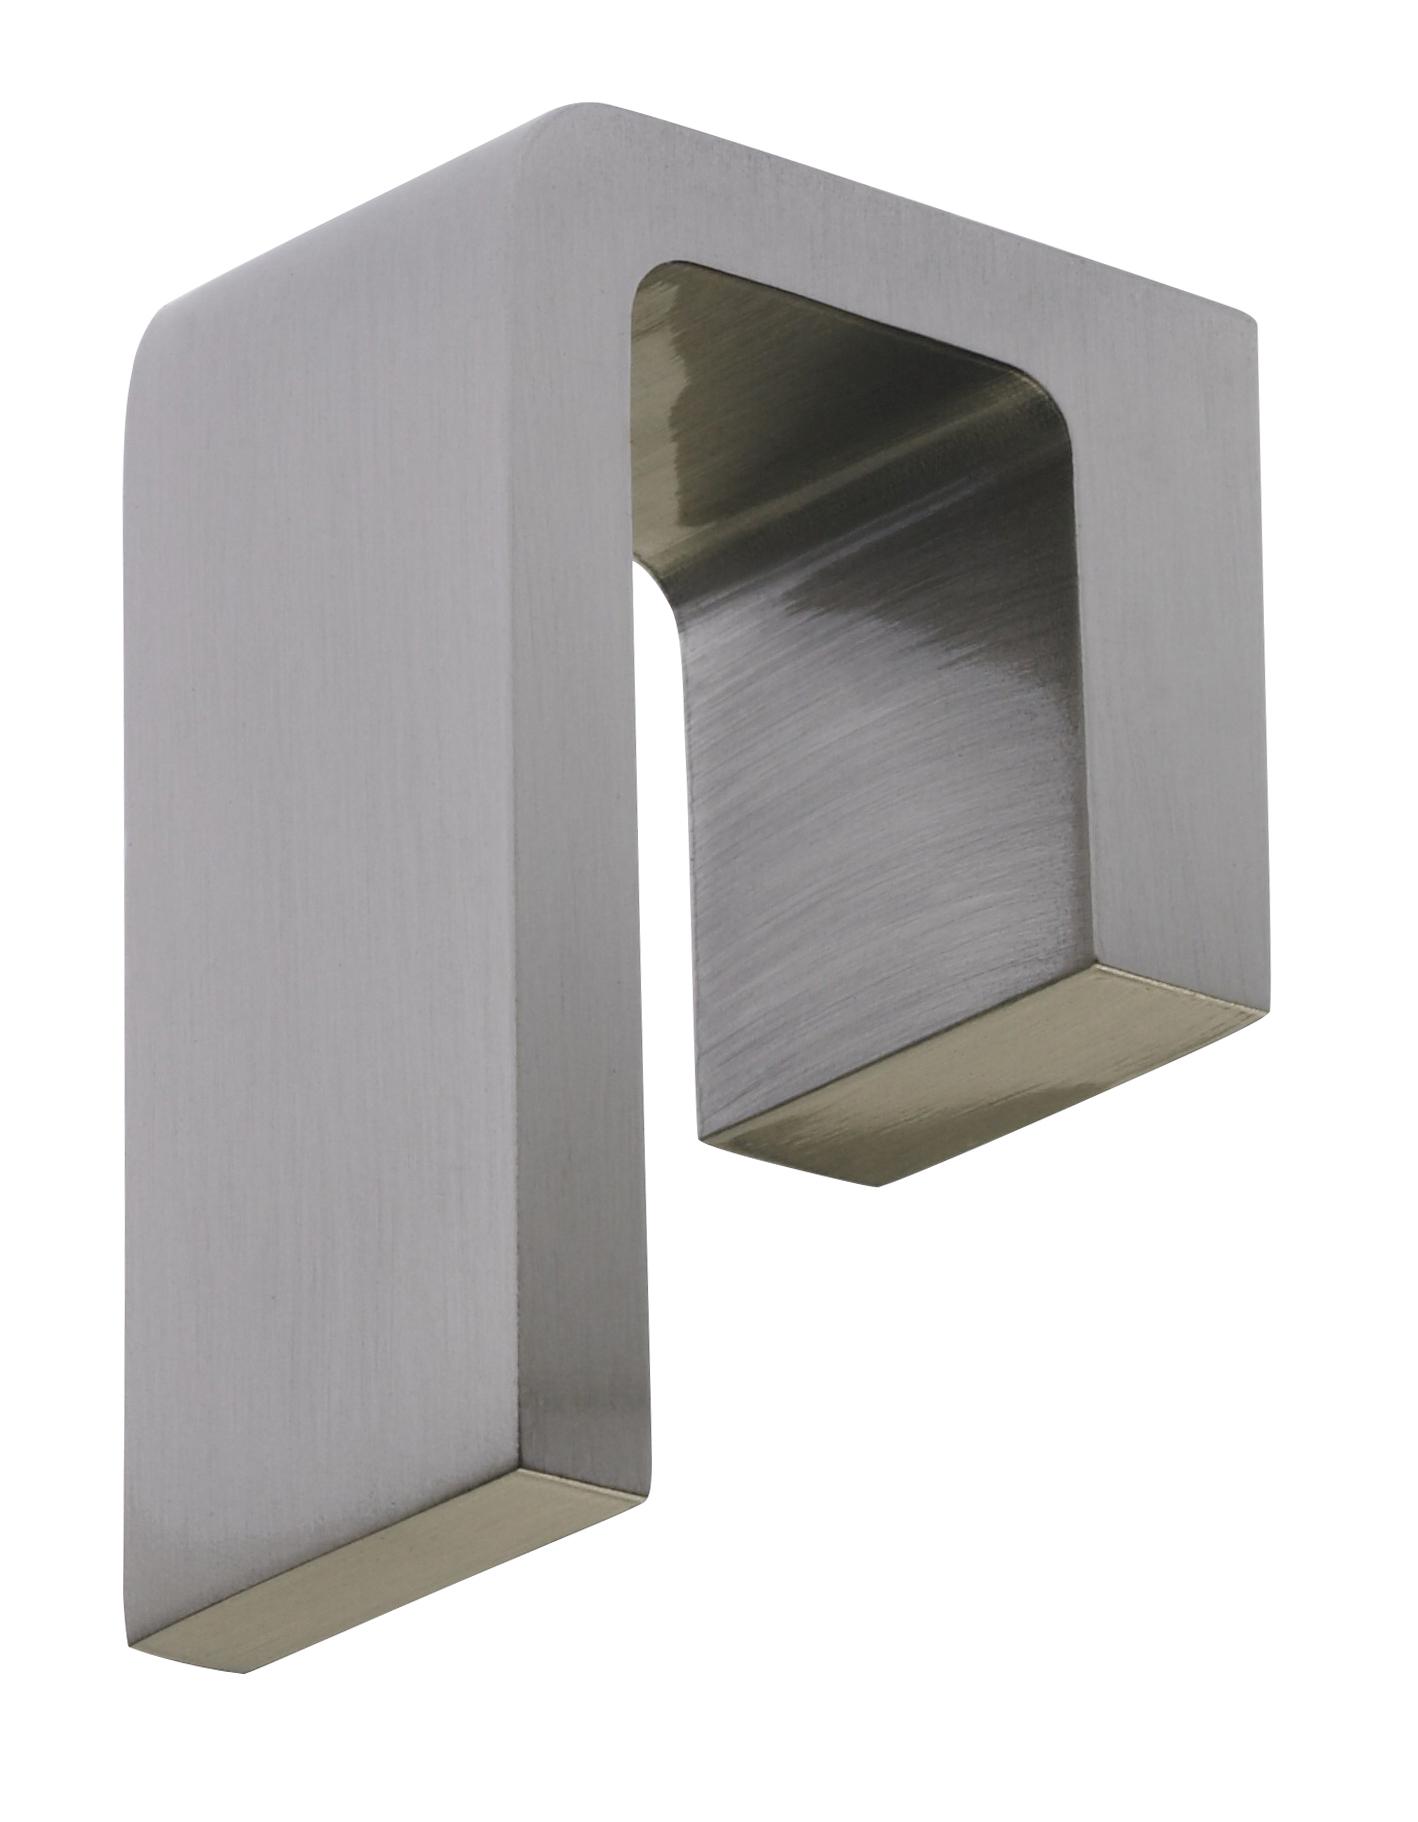 Linnea 2052 16mm Cabinet Knob